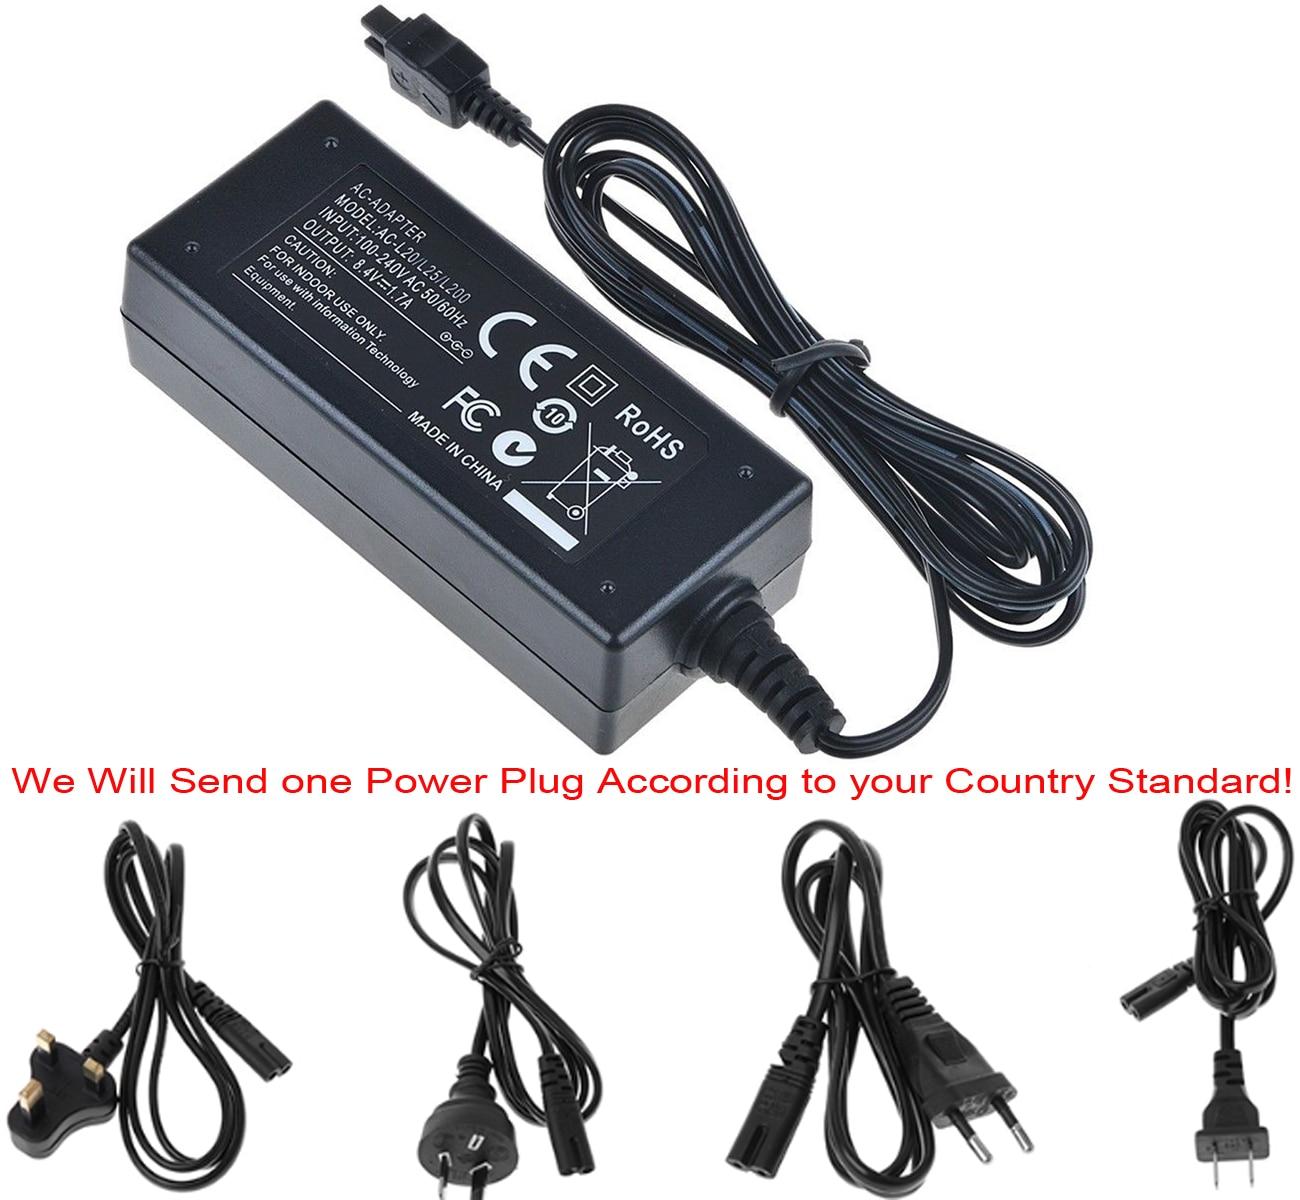 Ac Adapter Oplader Voor Sony DCR-HC20, HC26, HC28, HC30, HC32, HC36, HC38, HC40, HC42, HC46, HC48, HC52, HC62 Handycam Camcorder